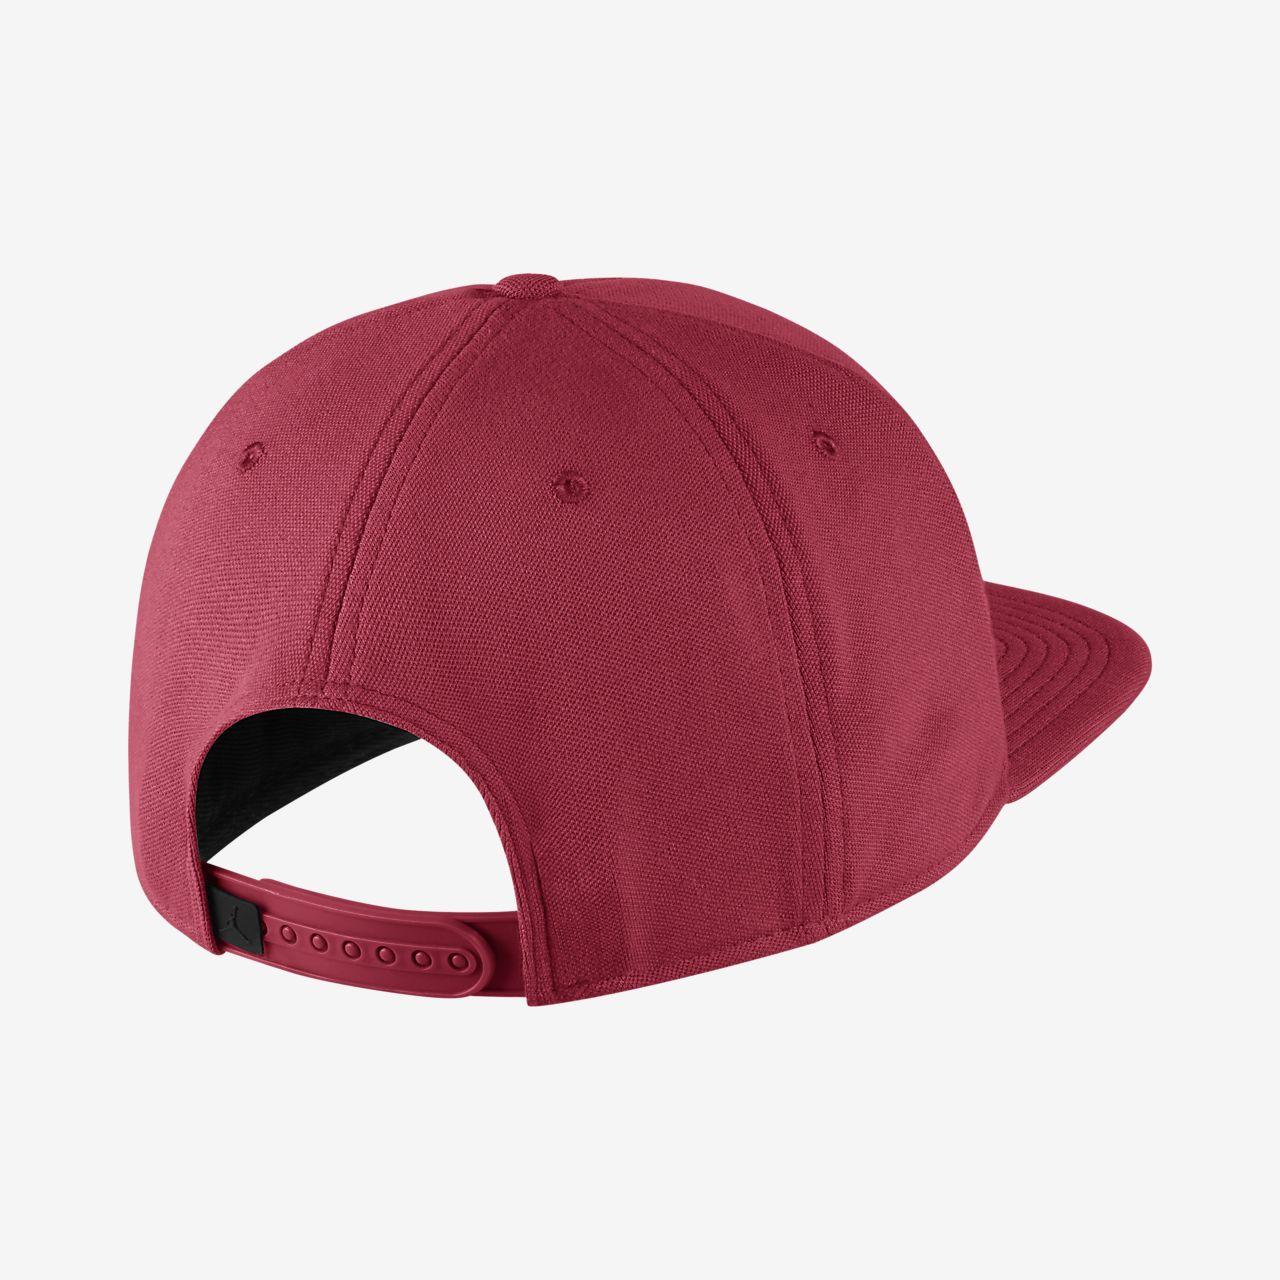 4717eb0eacc Low Resolution Jordan Jumpman Snapback Adjustable Hat Jordan Jumpman  Snapback Adjustable Hat